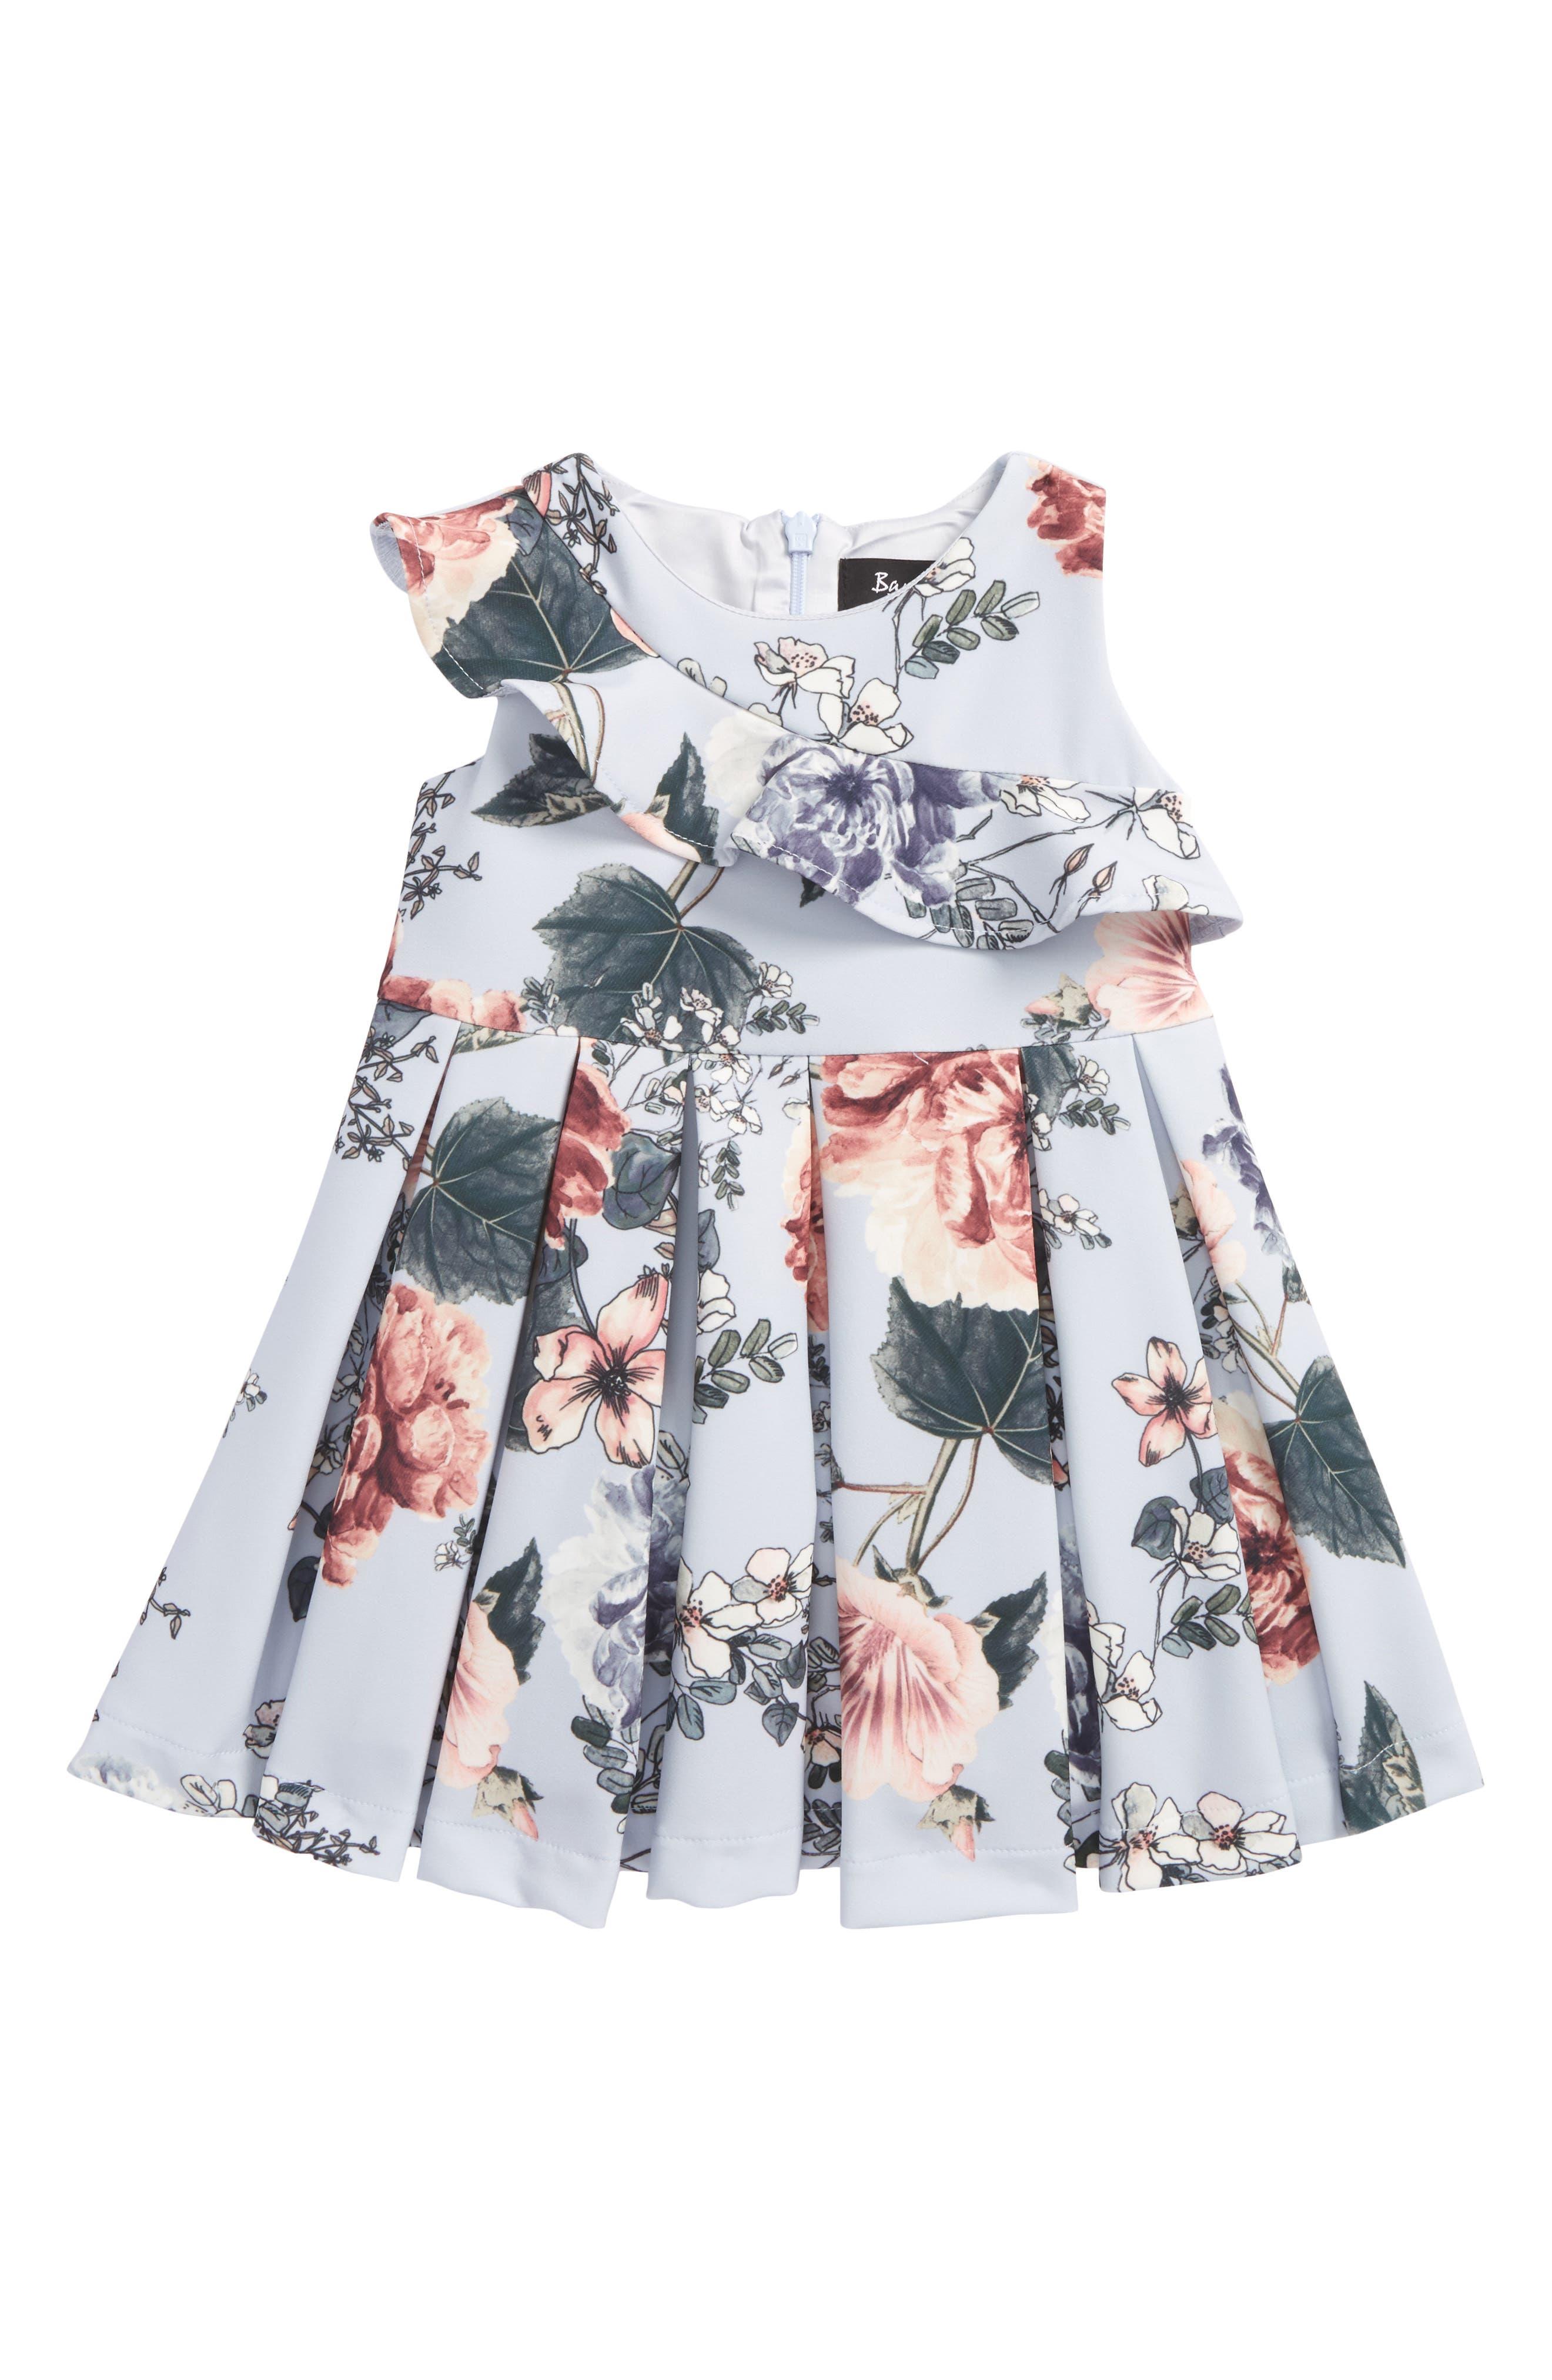 Ebony Floral Print Dress,                             Main thumbnail 1, color,                             Floral